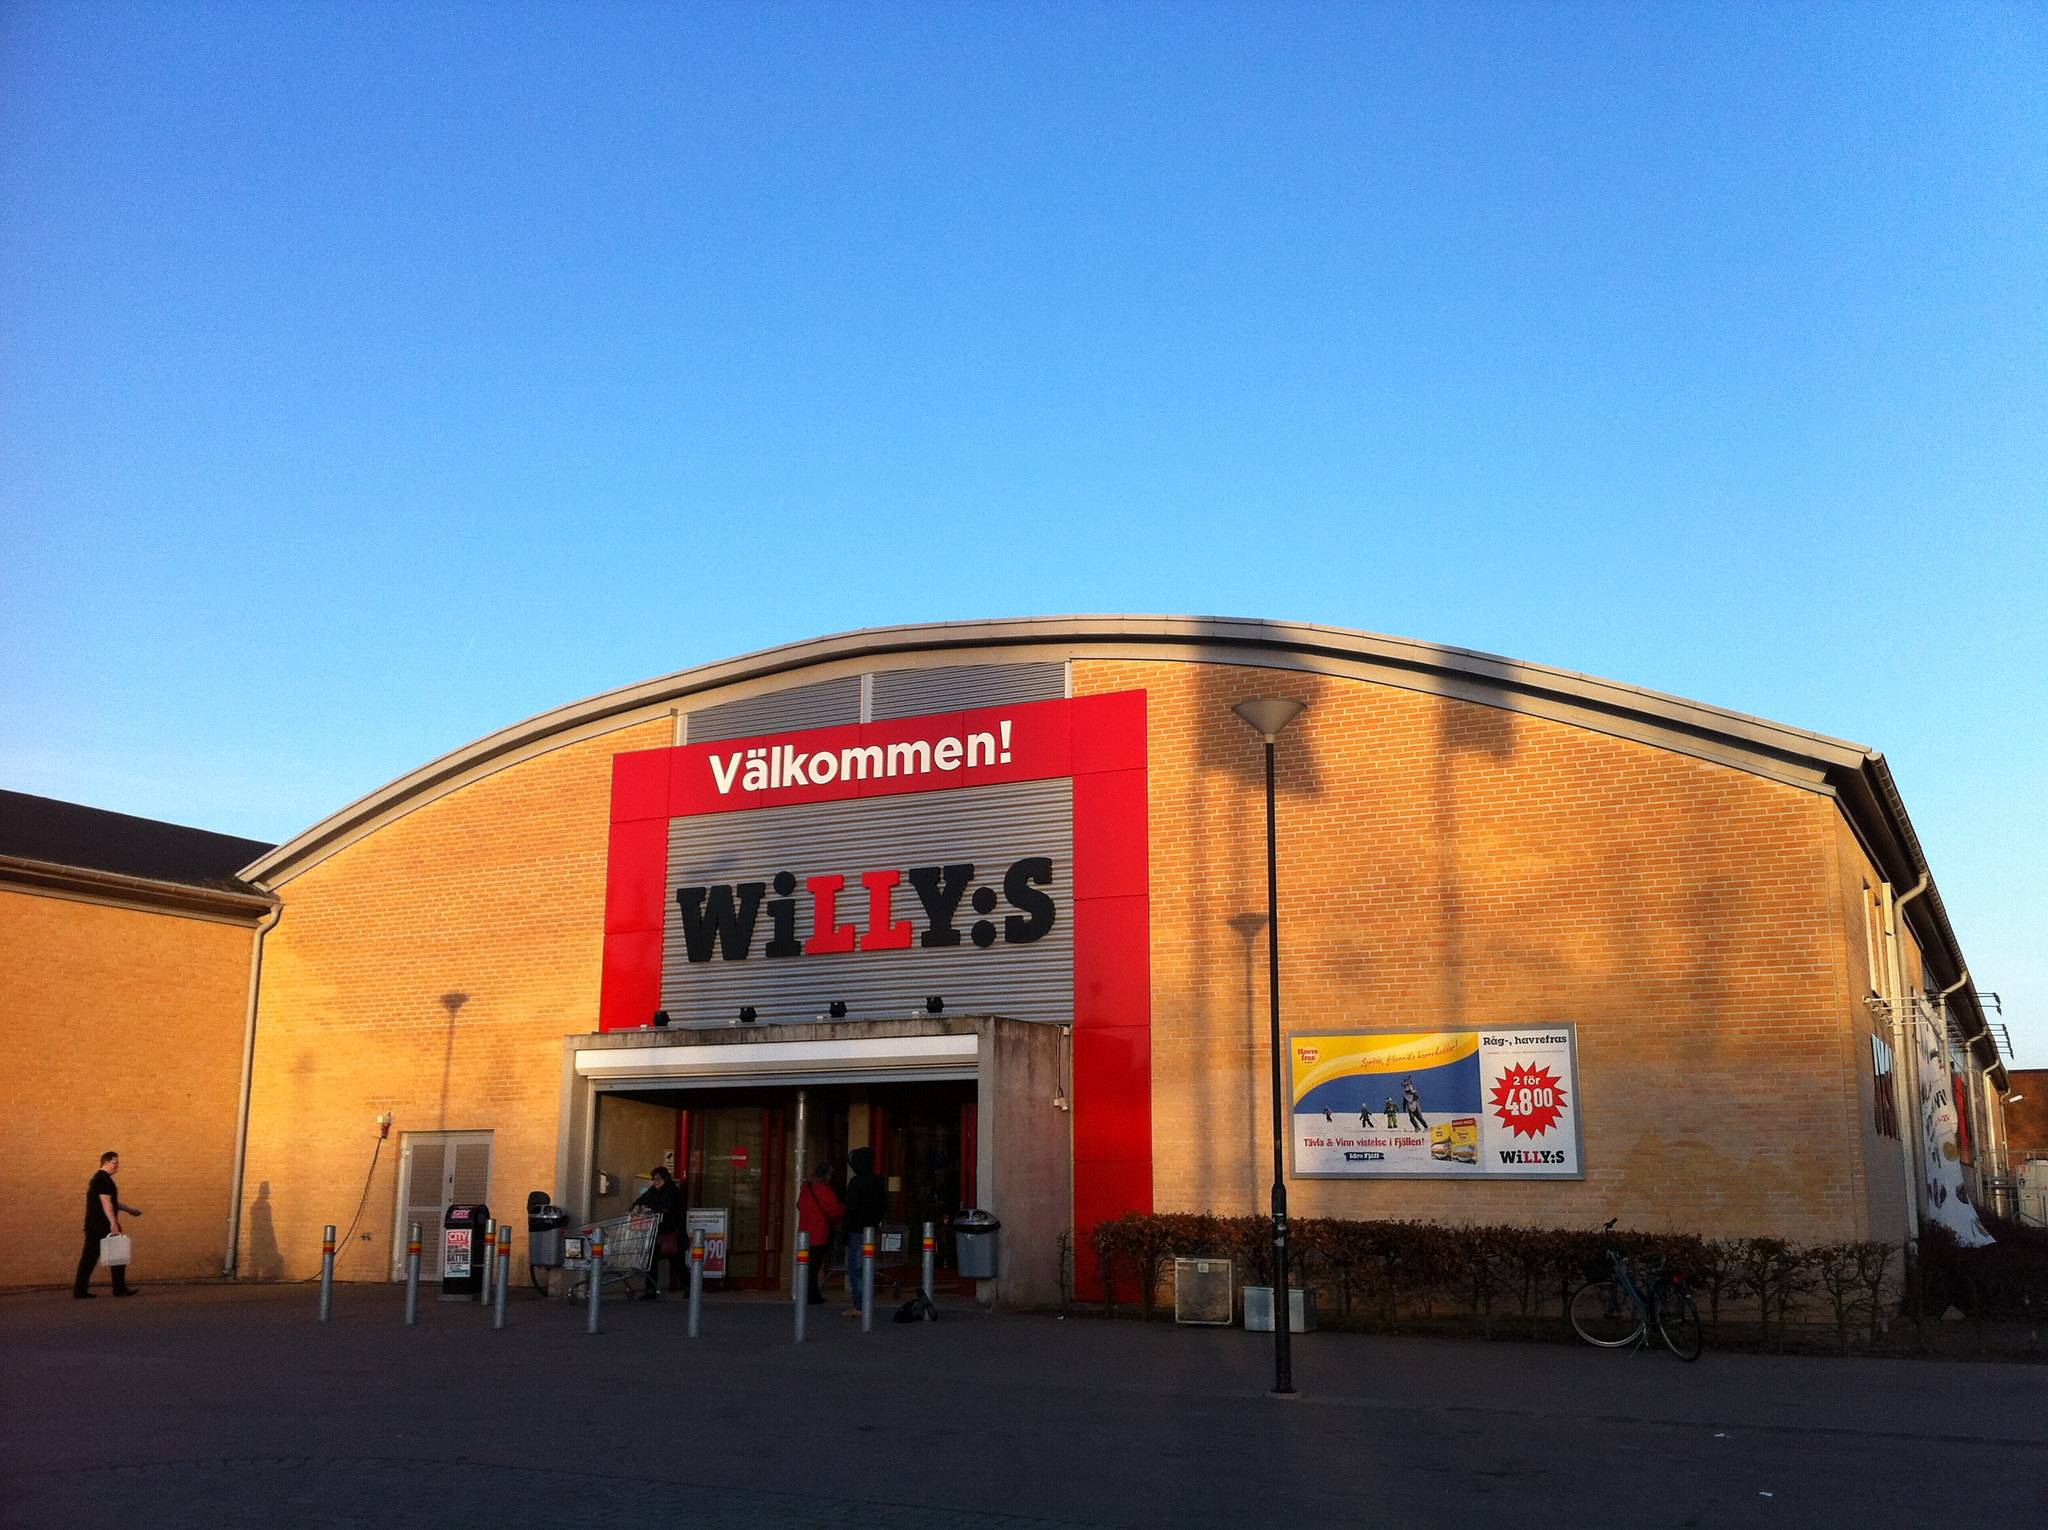 Willys butik